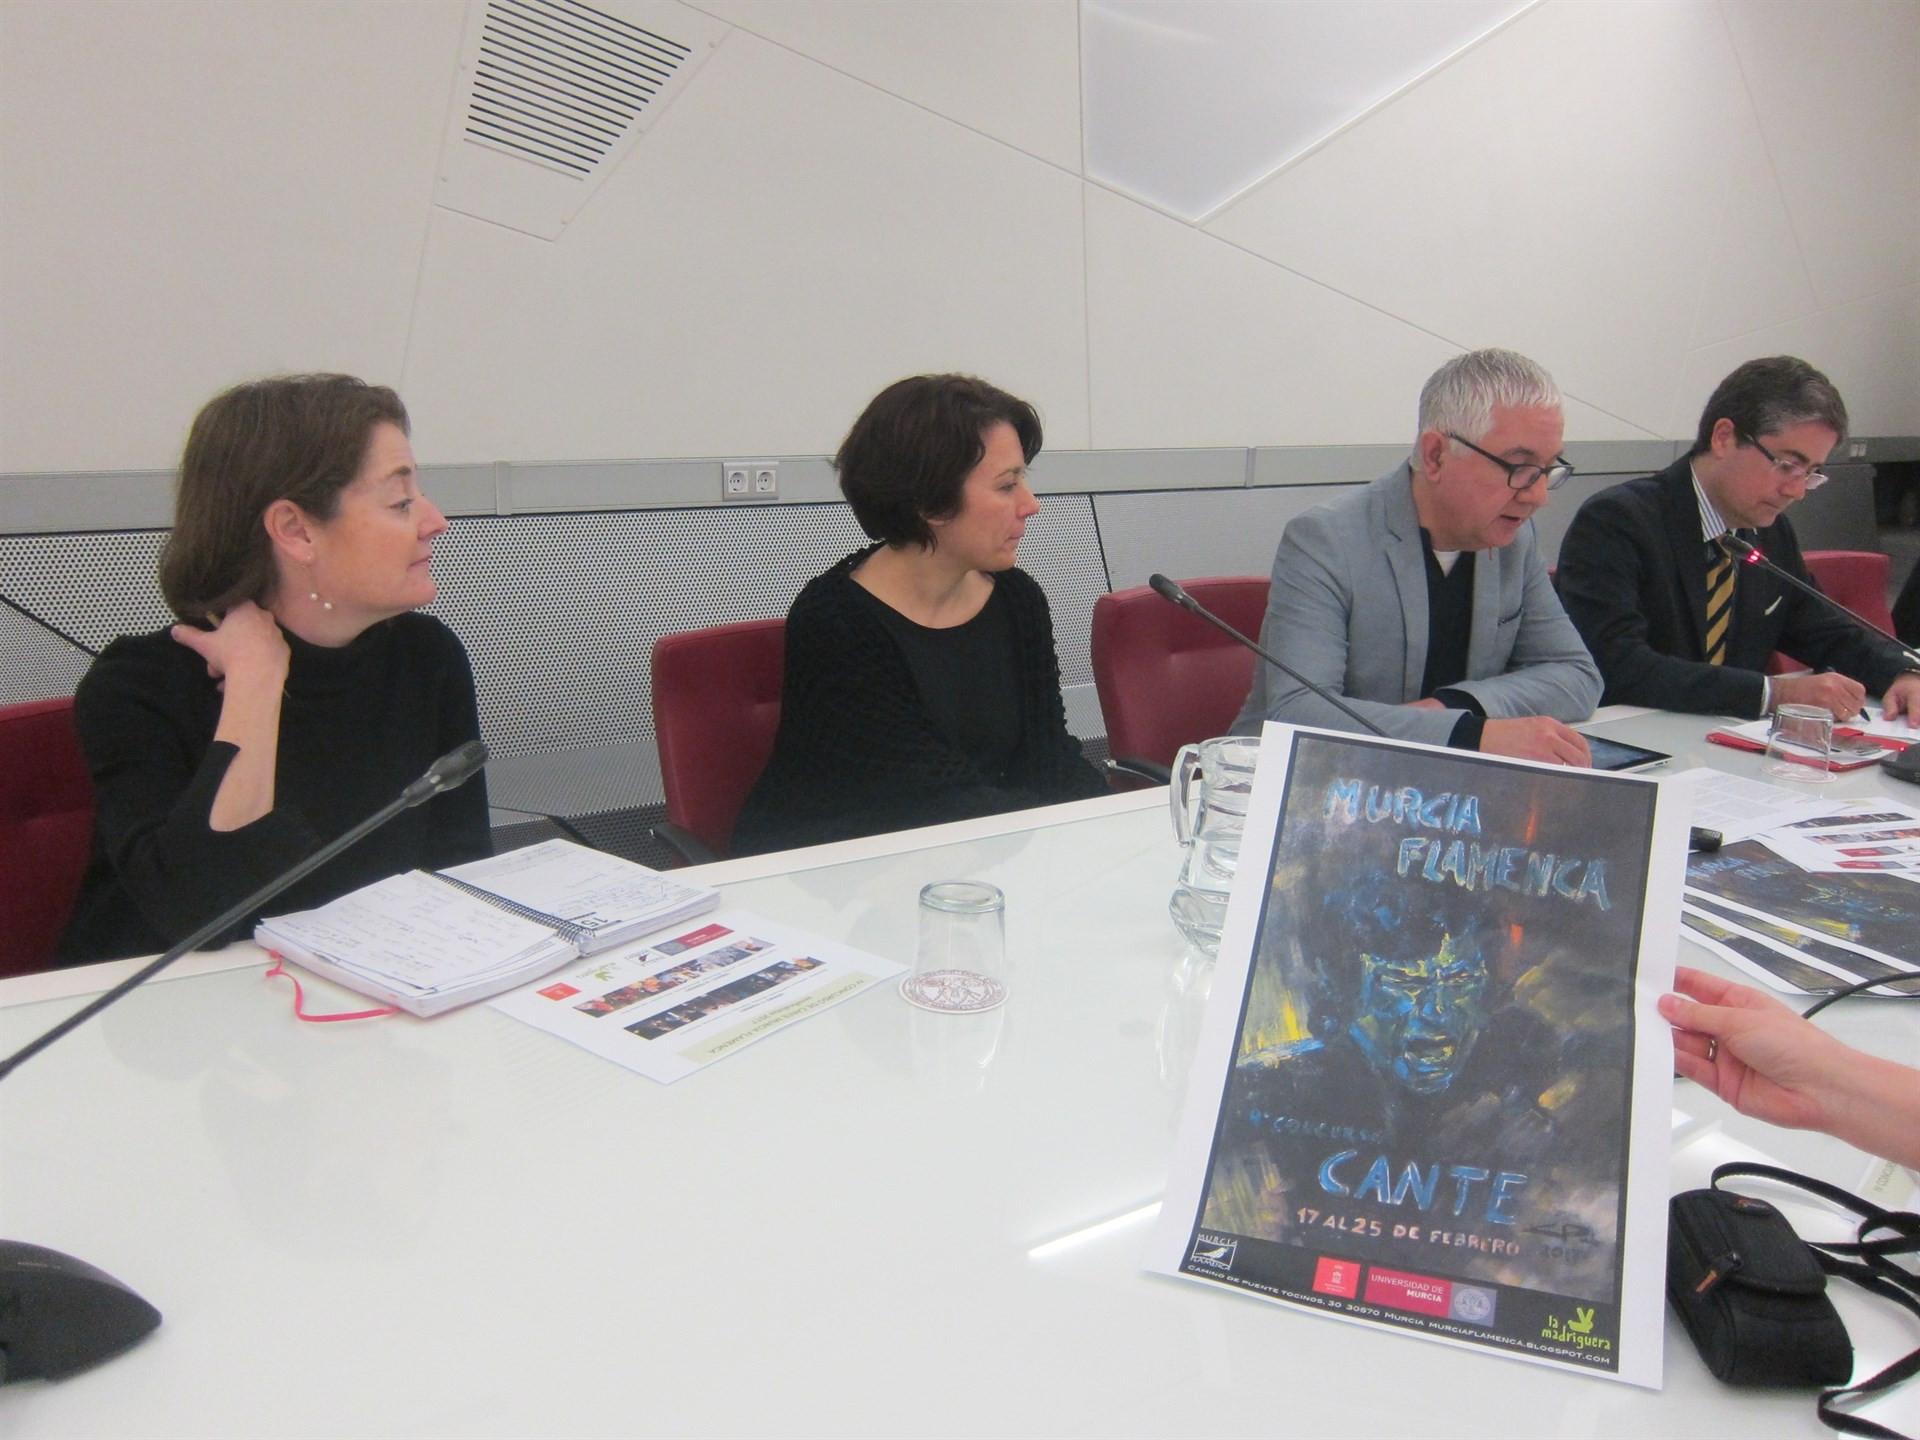 Presentacion concurso flamenco